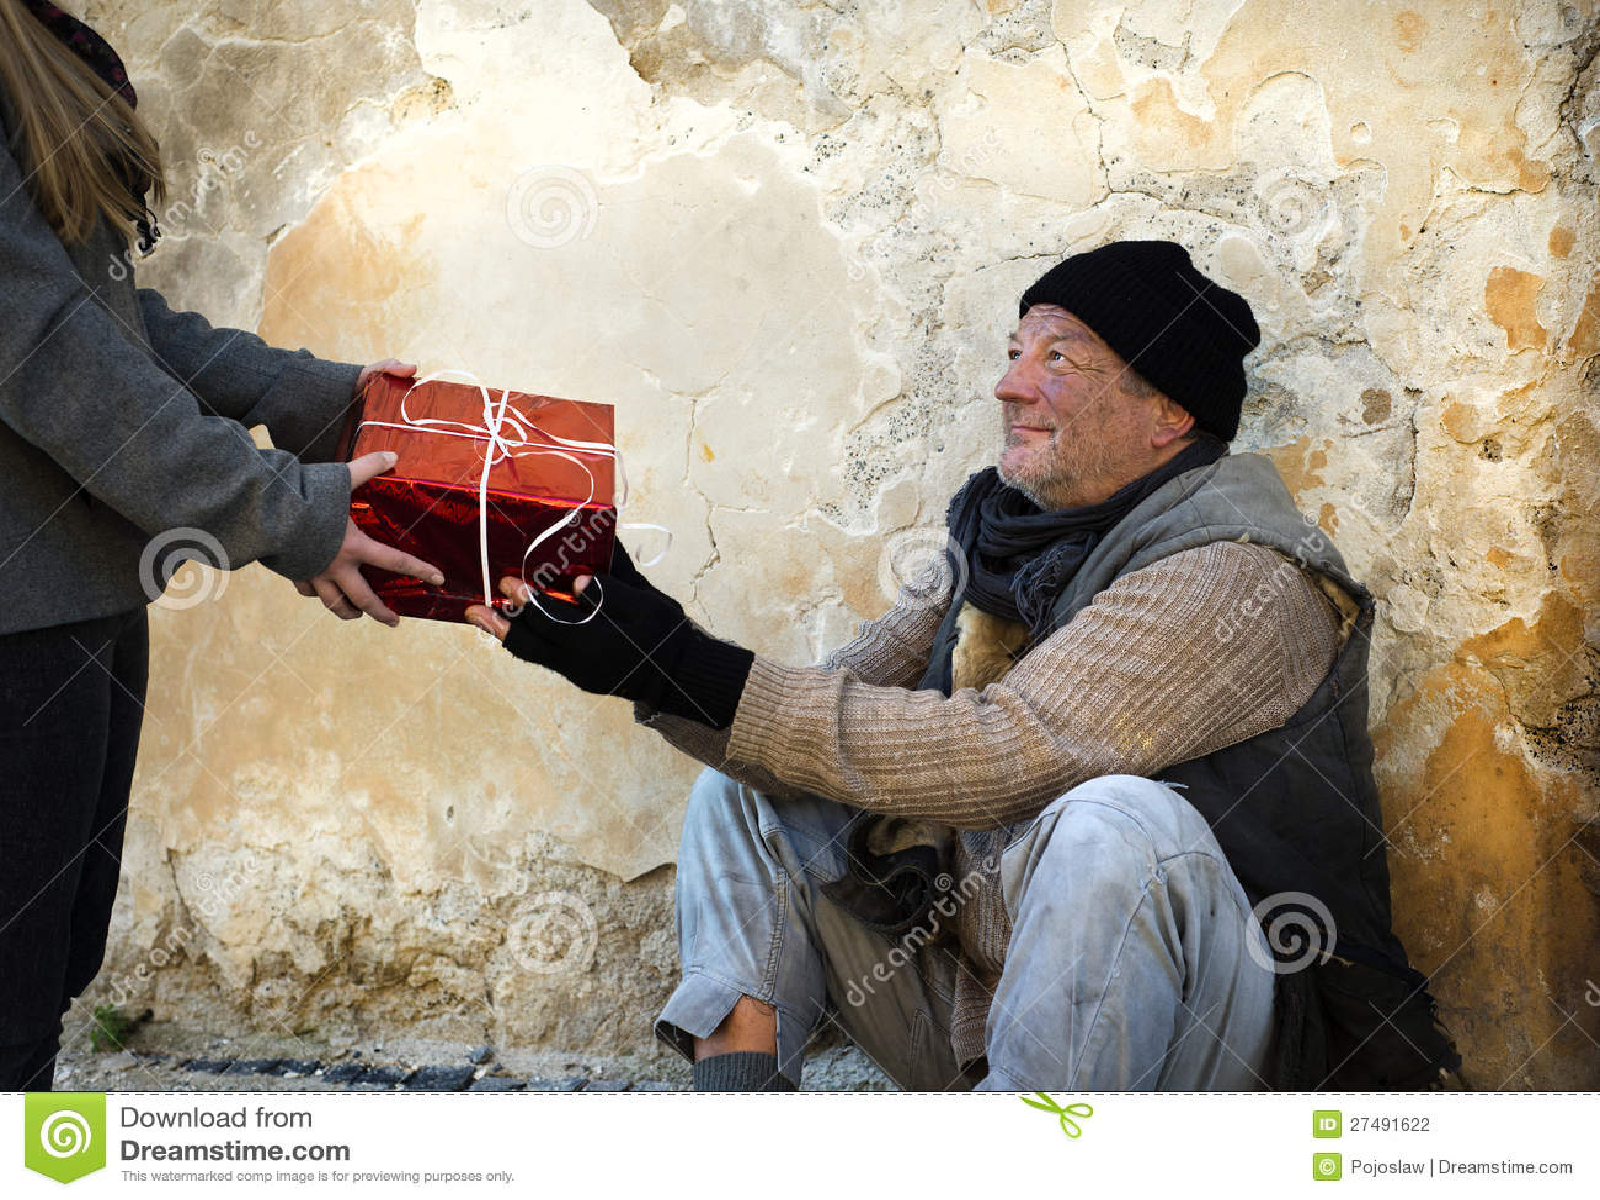 Christmas Gift For Homeless Man Stock Photography